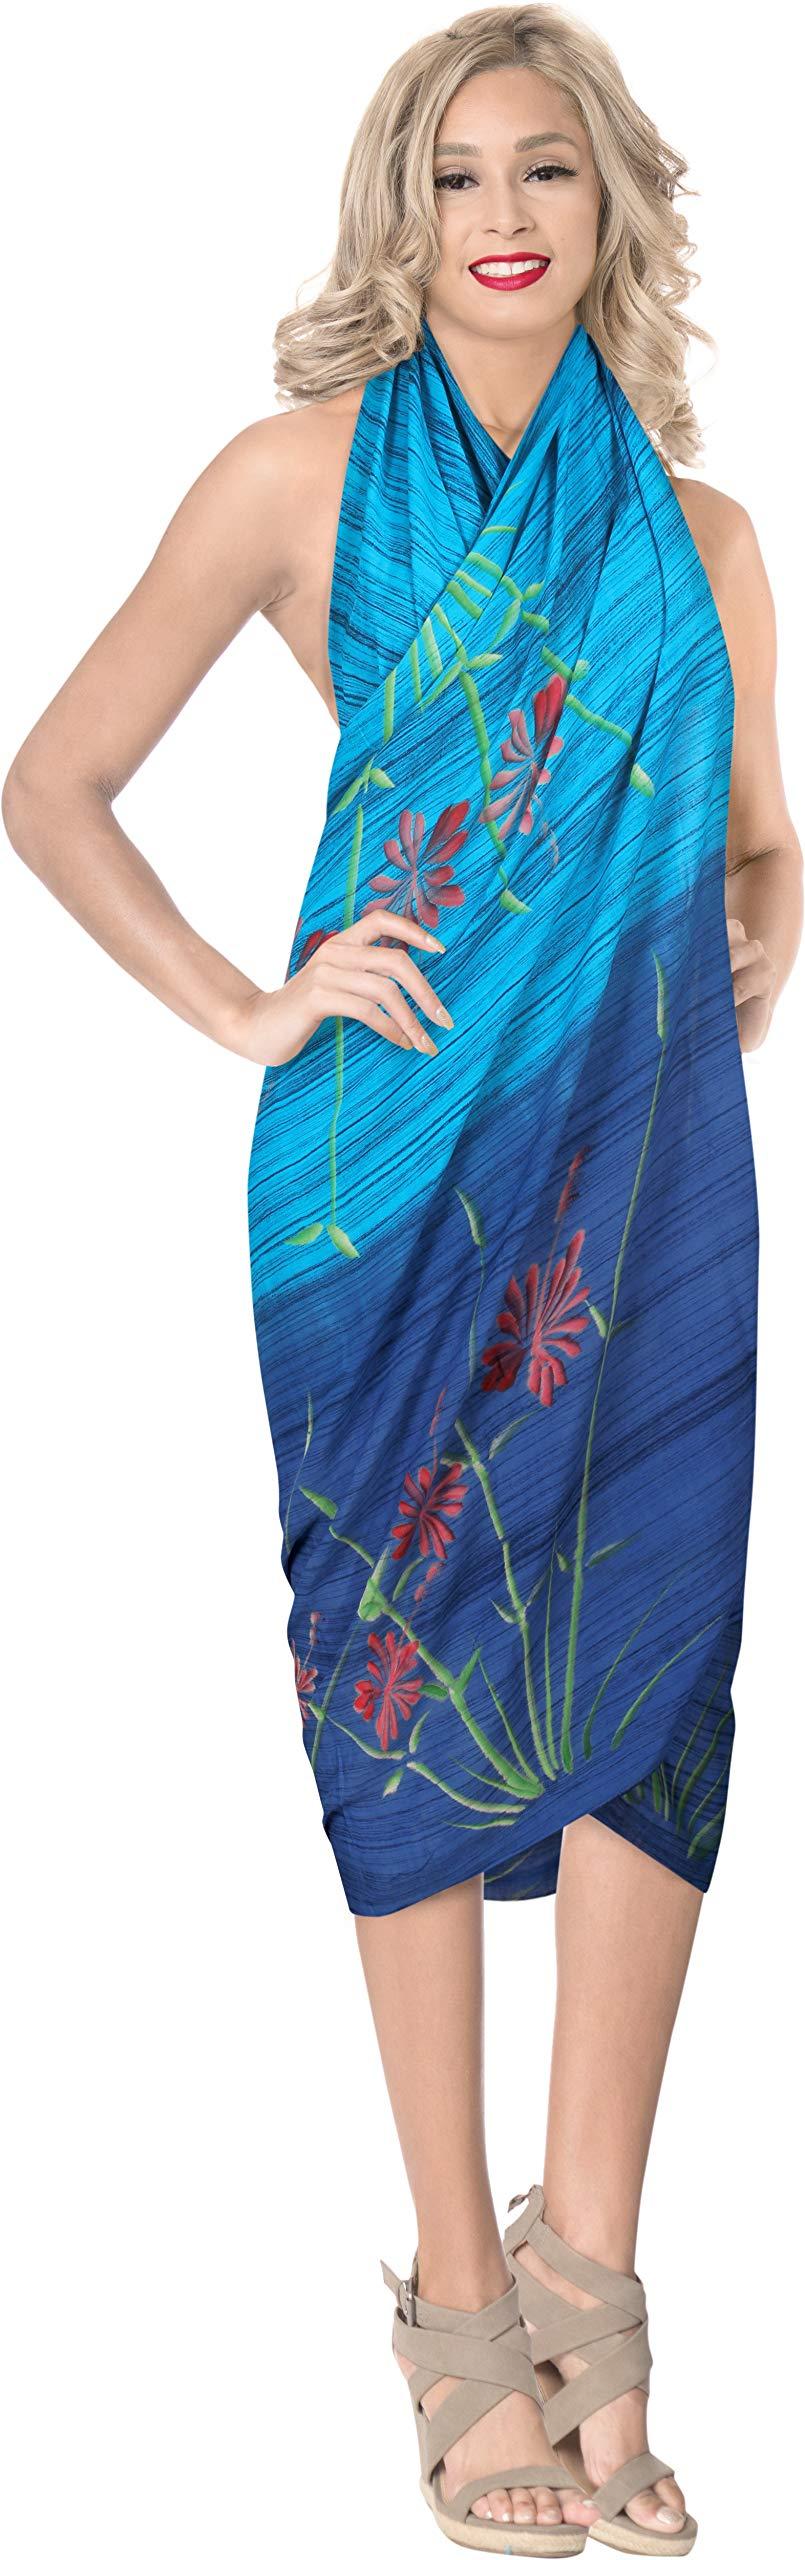 LA LEELA Rayon Coprire Costume da Bagno Avvolgente Sarong Tie Dye Un 4 spesavip